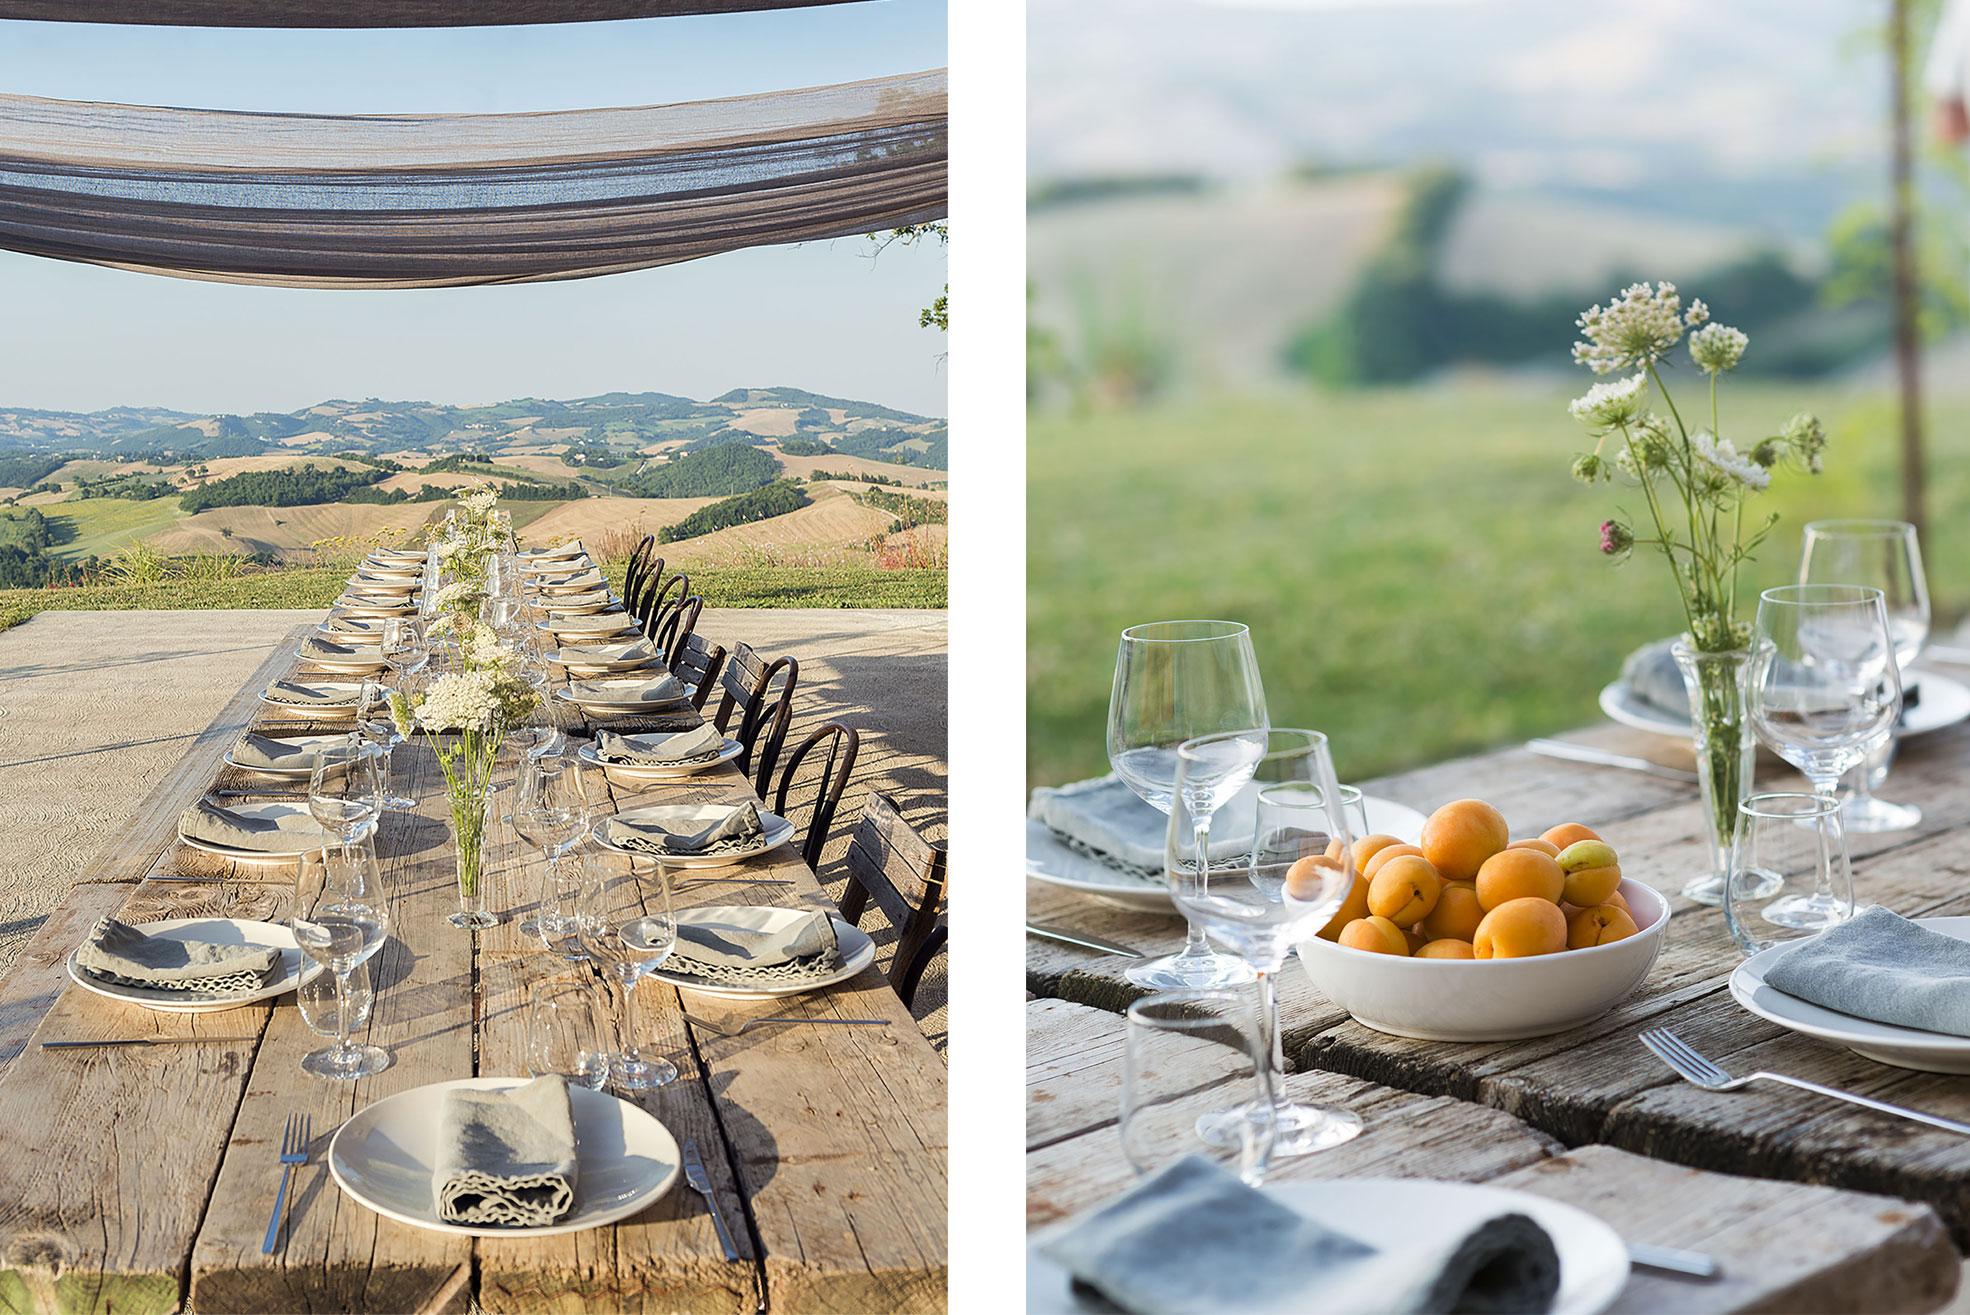 Set table for dinner outside at Malatetsa Maison de Charme in the marche hills Photographer Maria Teresa Furnari